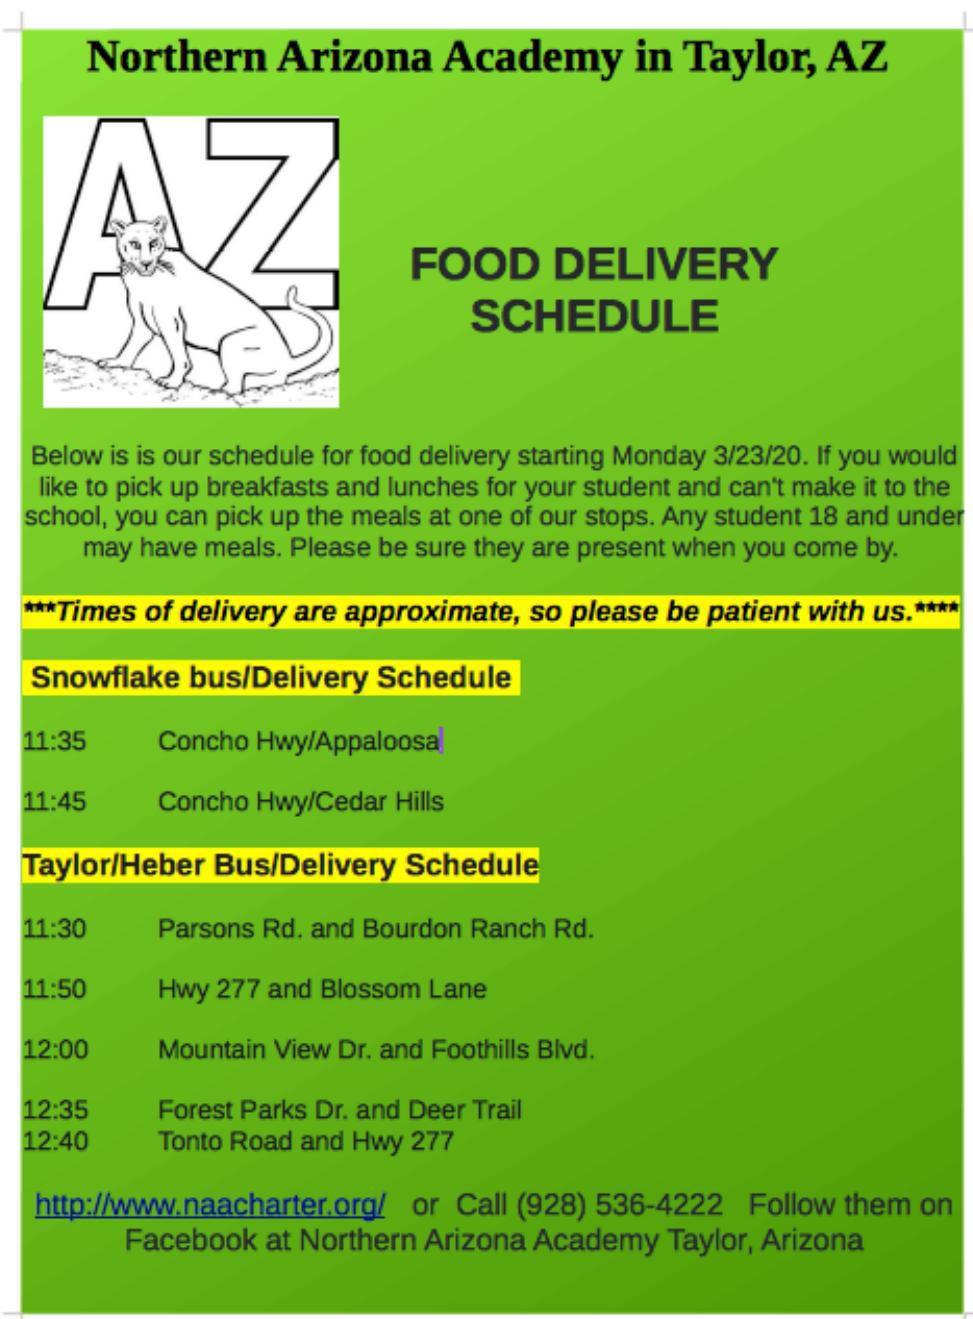 Northern AZ Academy - Meal schedule